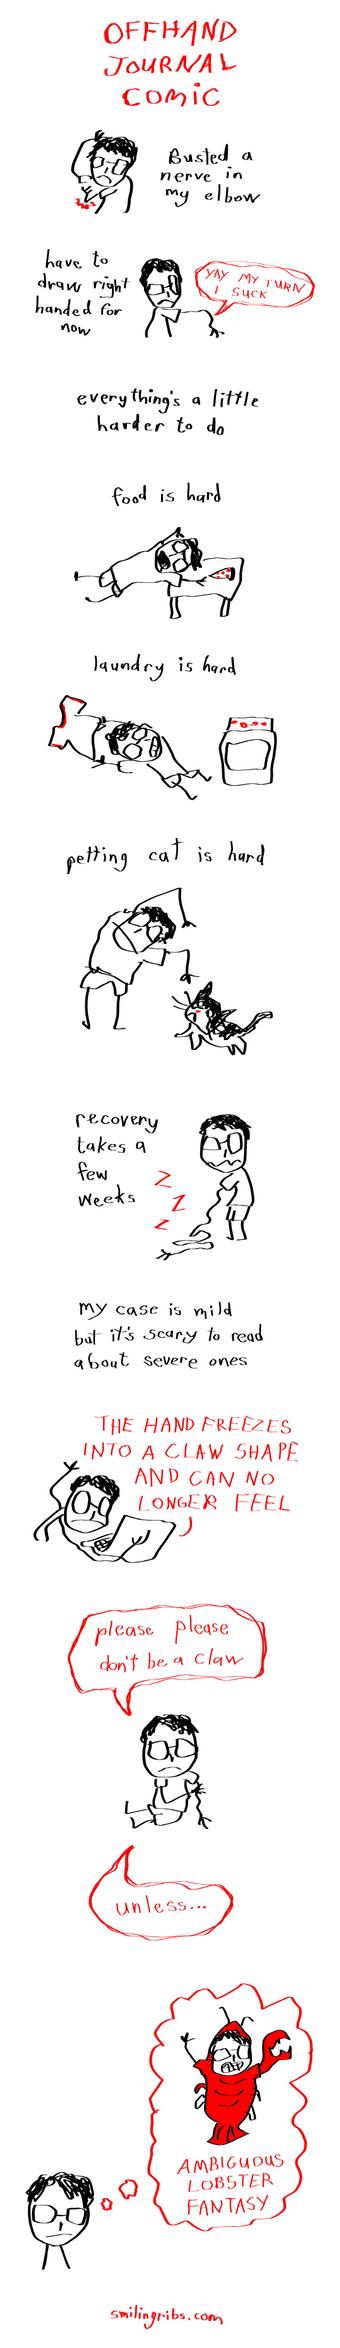 Offhand Journal Comic by inkblort